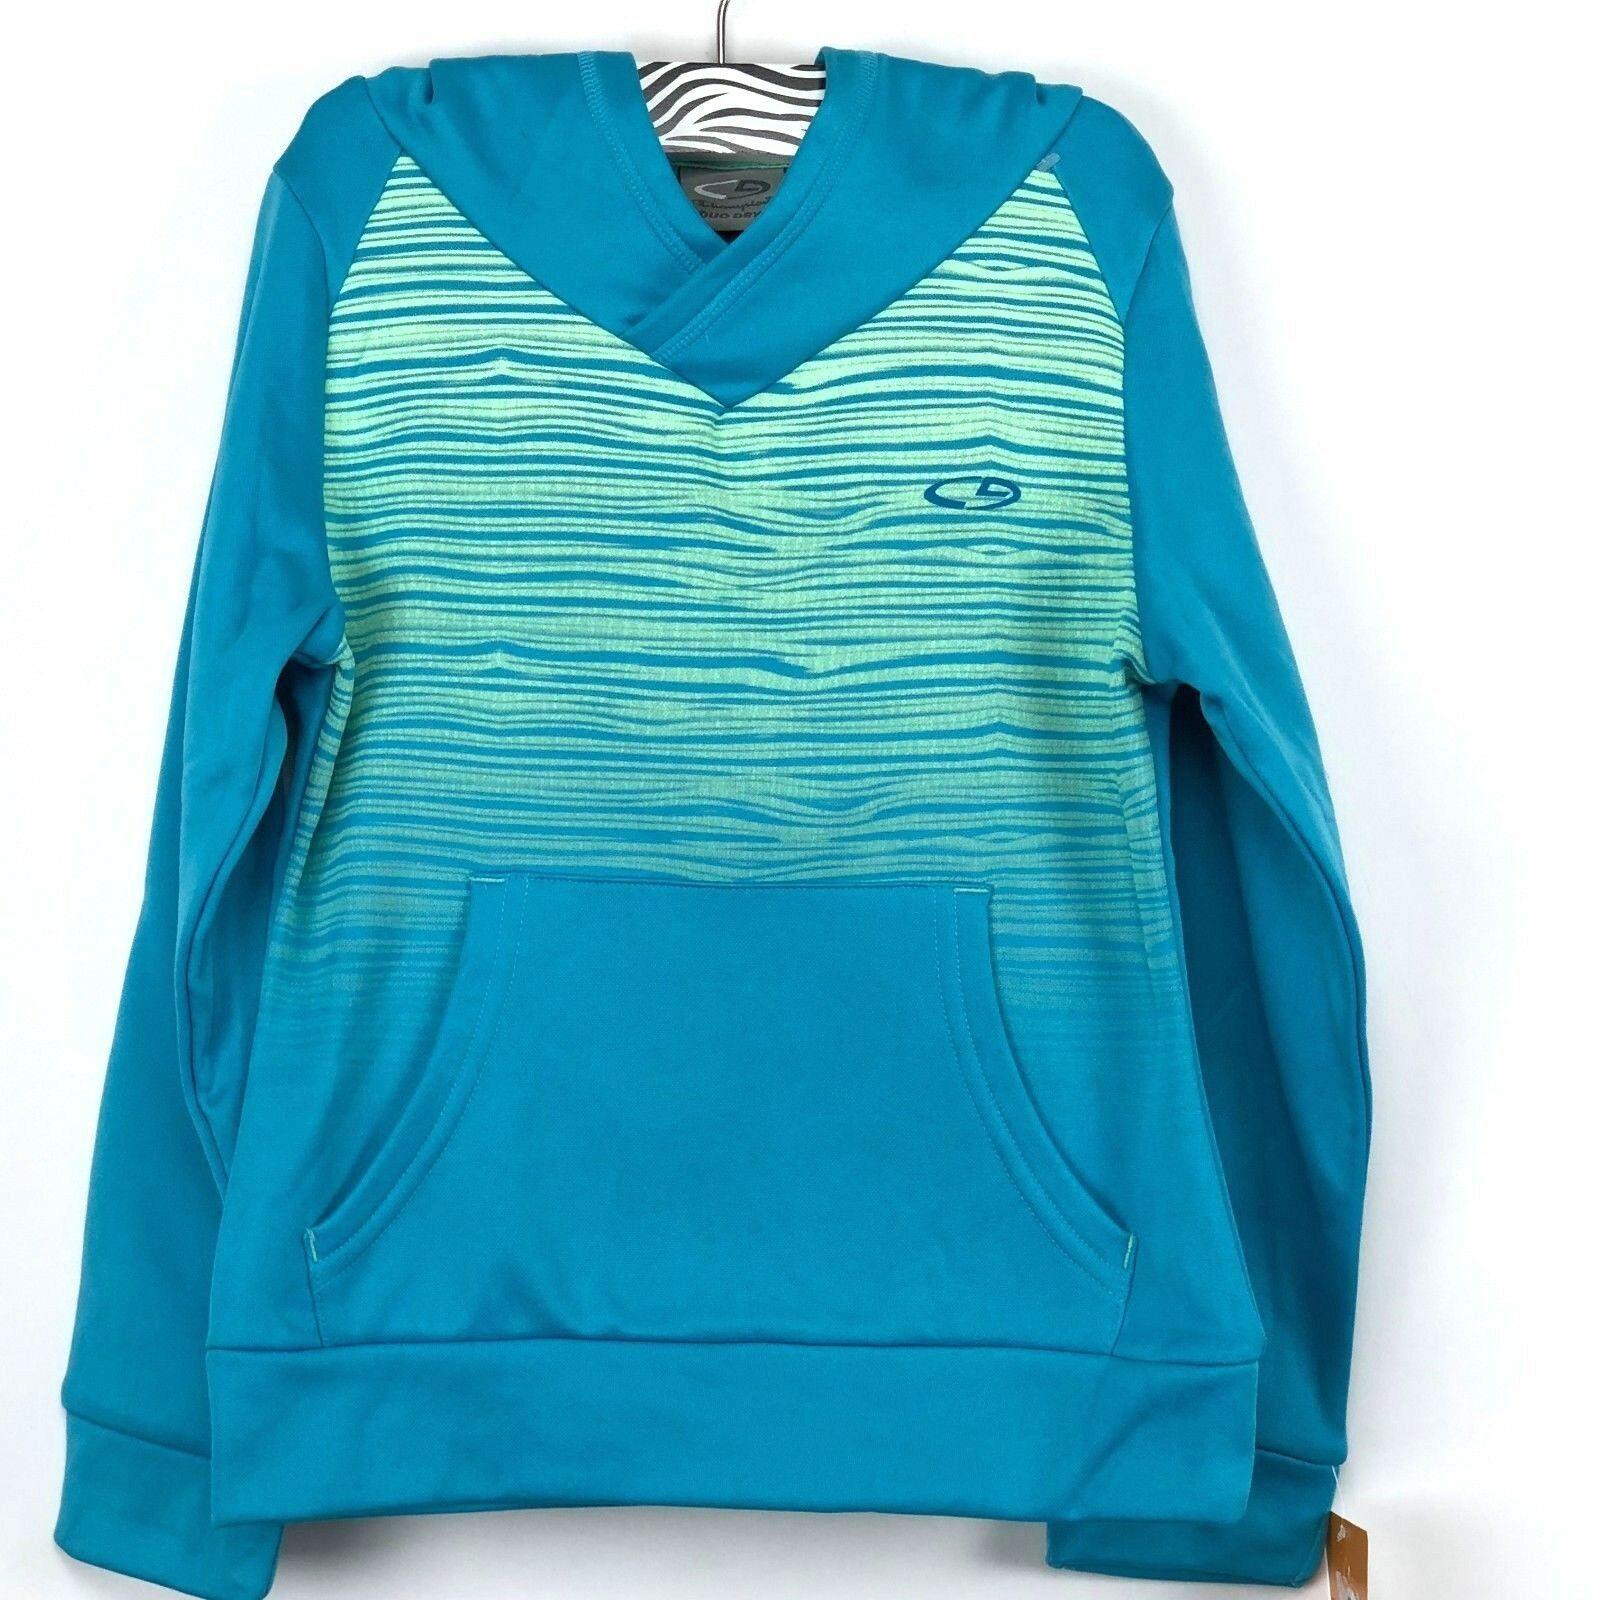 Champion Duo Dry Girls Hoodie Blue Green Pullover Sweatshirt Size XS 4 - 5 - $13.97